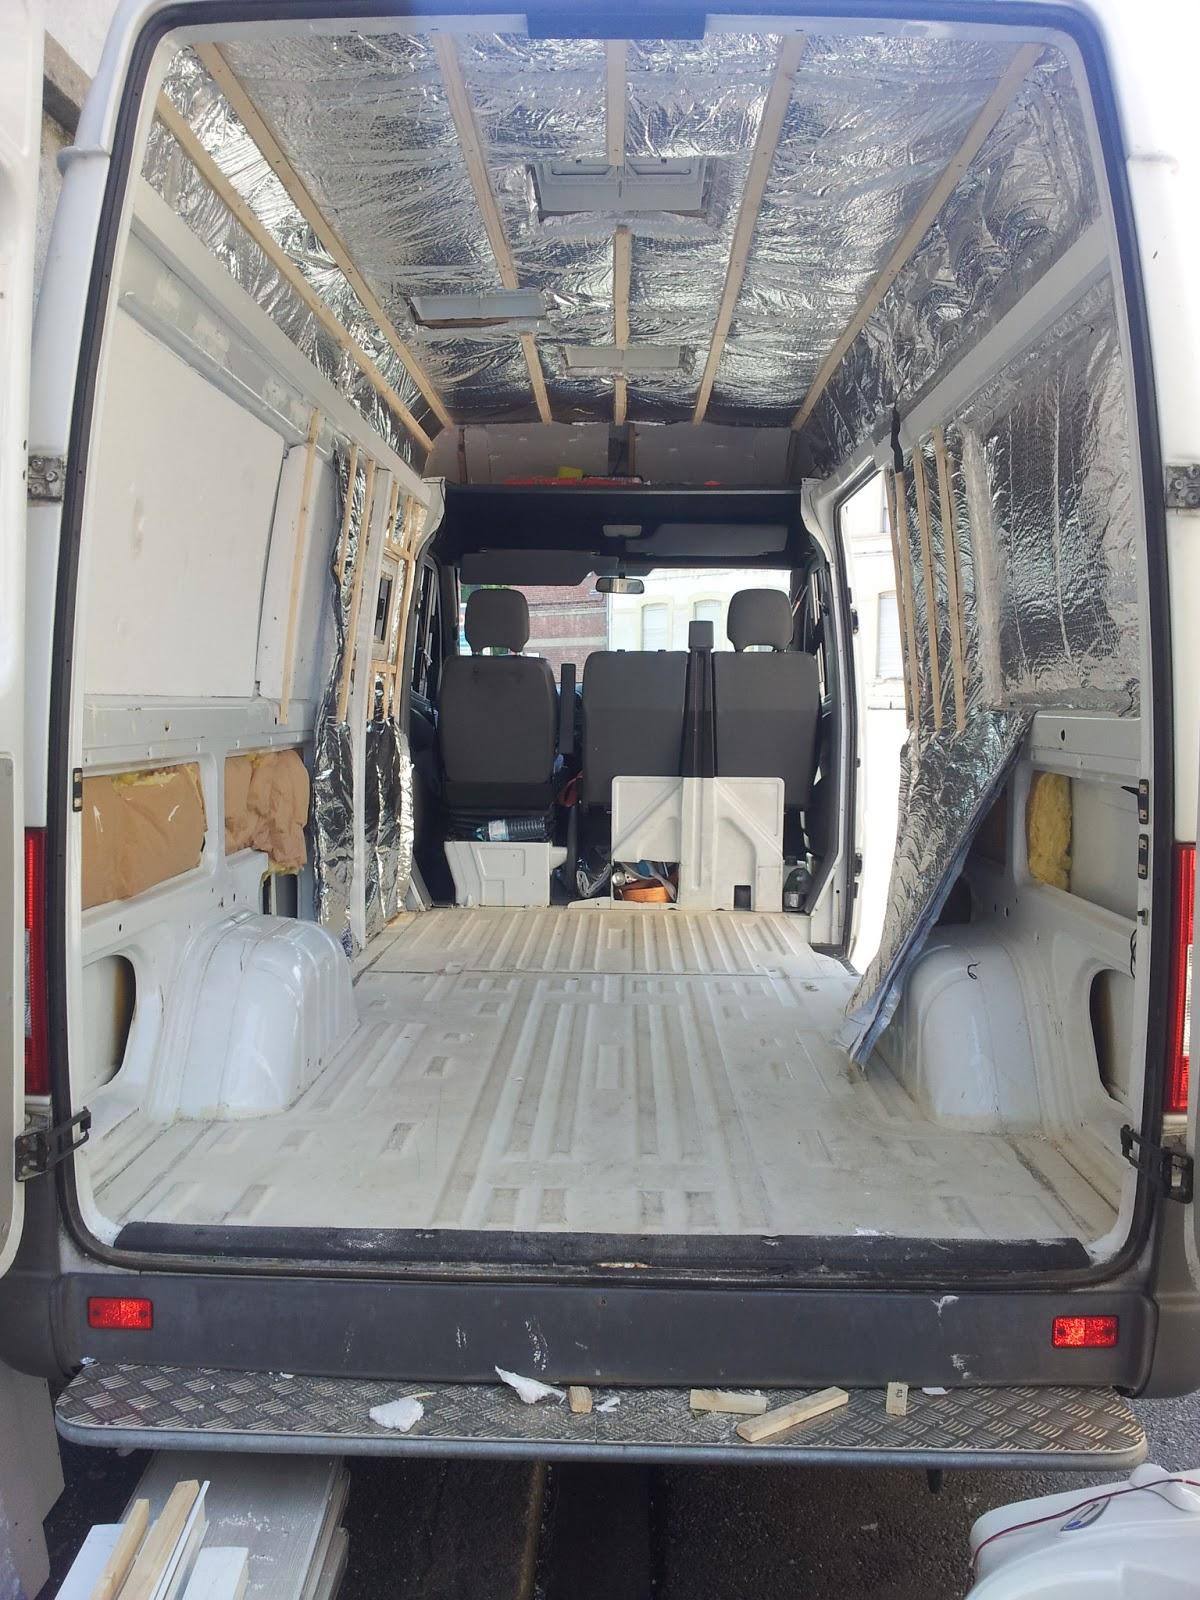 am nagement d 39 un sprinter en camping car isolation de la. Black Bedroom Furniture Sets. Home Design Ideas